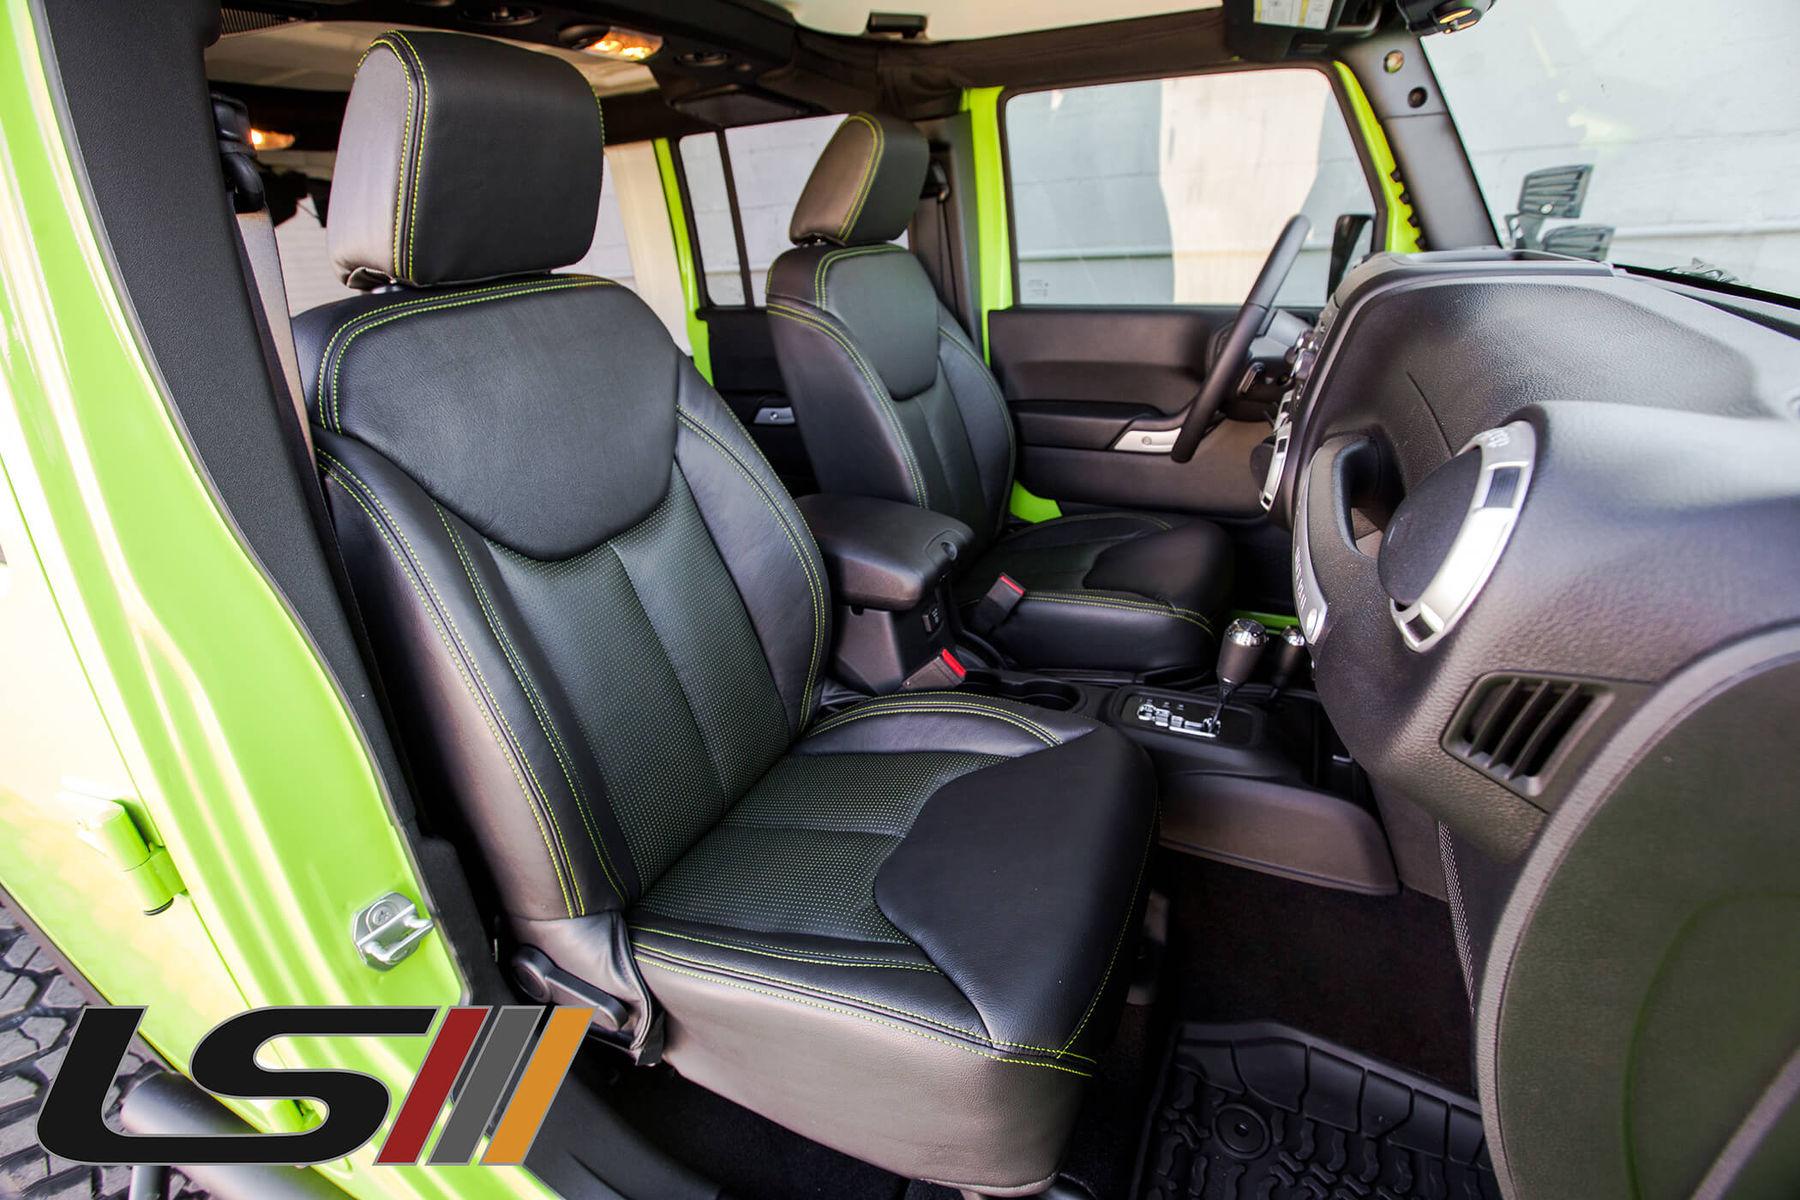 Jeep Wrangler Leather Seats Best Seat 2018 Jk New Unlimited Sahara 4x4 Heated